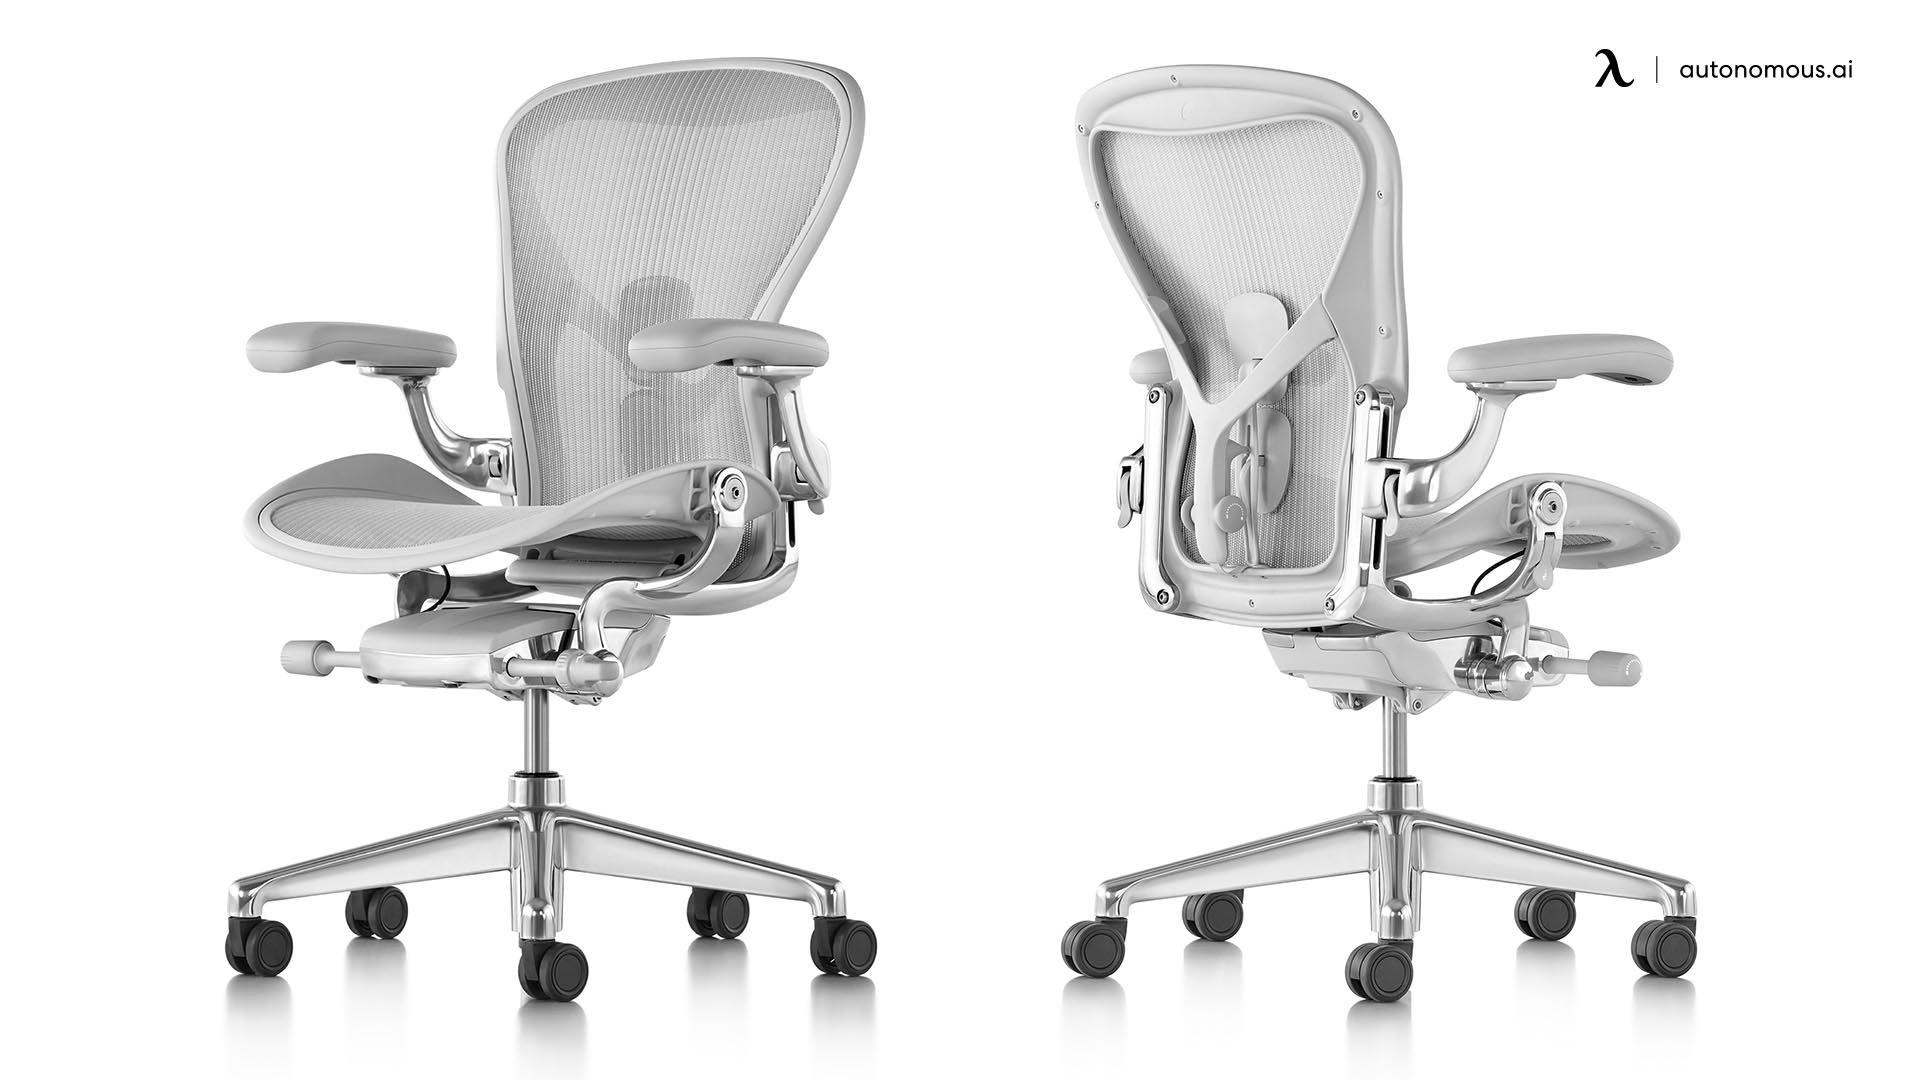 Aeron Ergonomic Chair